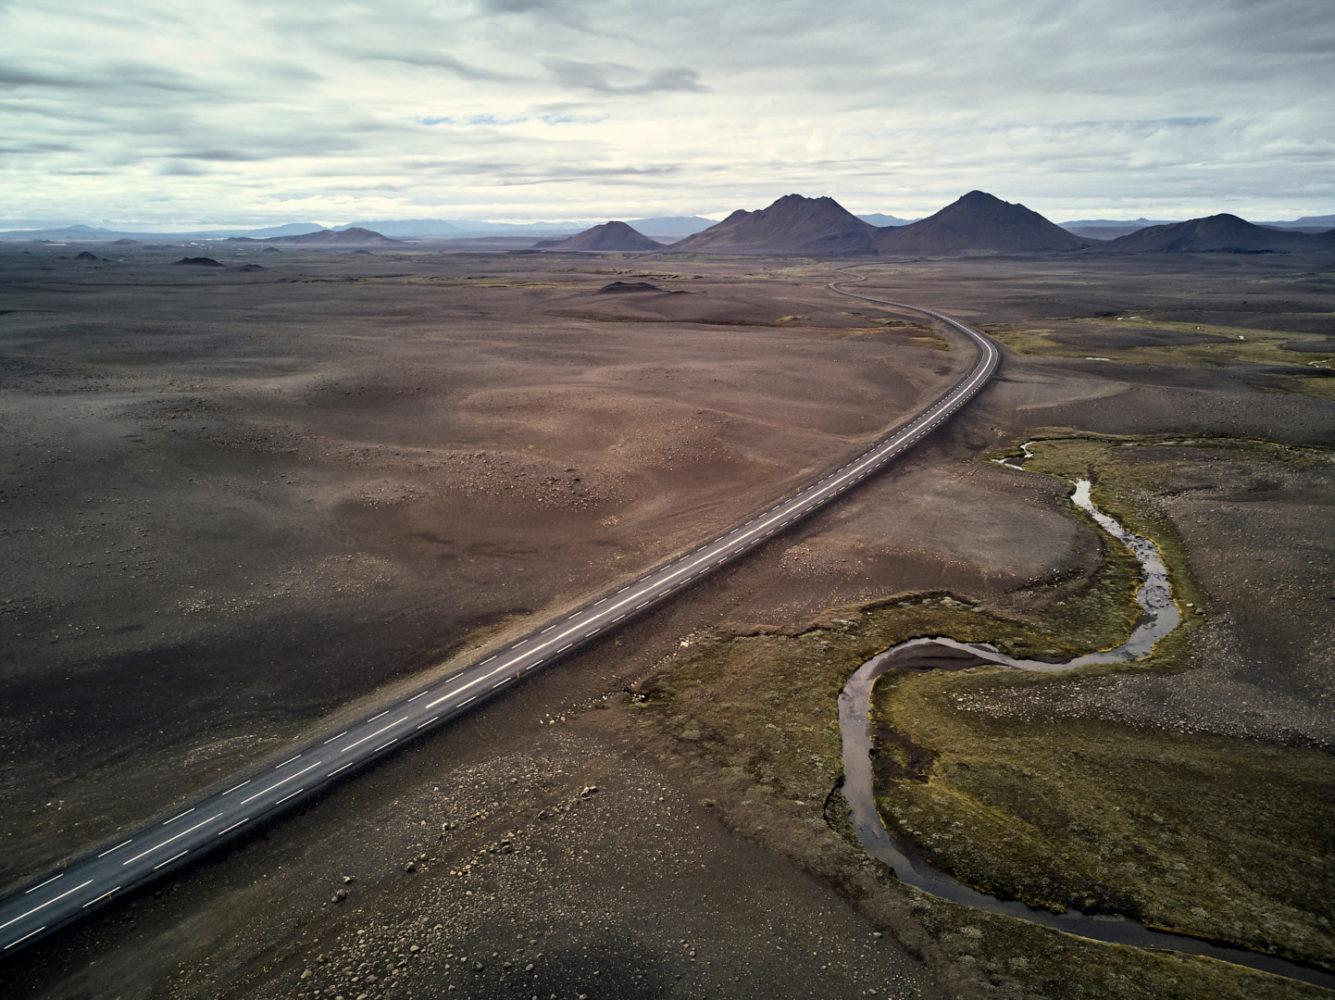 iceland, roadtrip, route für den roadtrip, island route, miles and shores, travelblog, travelblogger, rundreise, autoreise